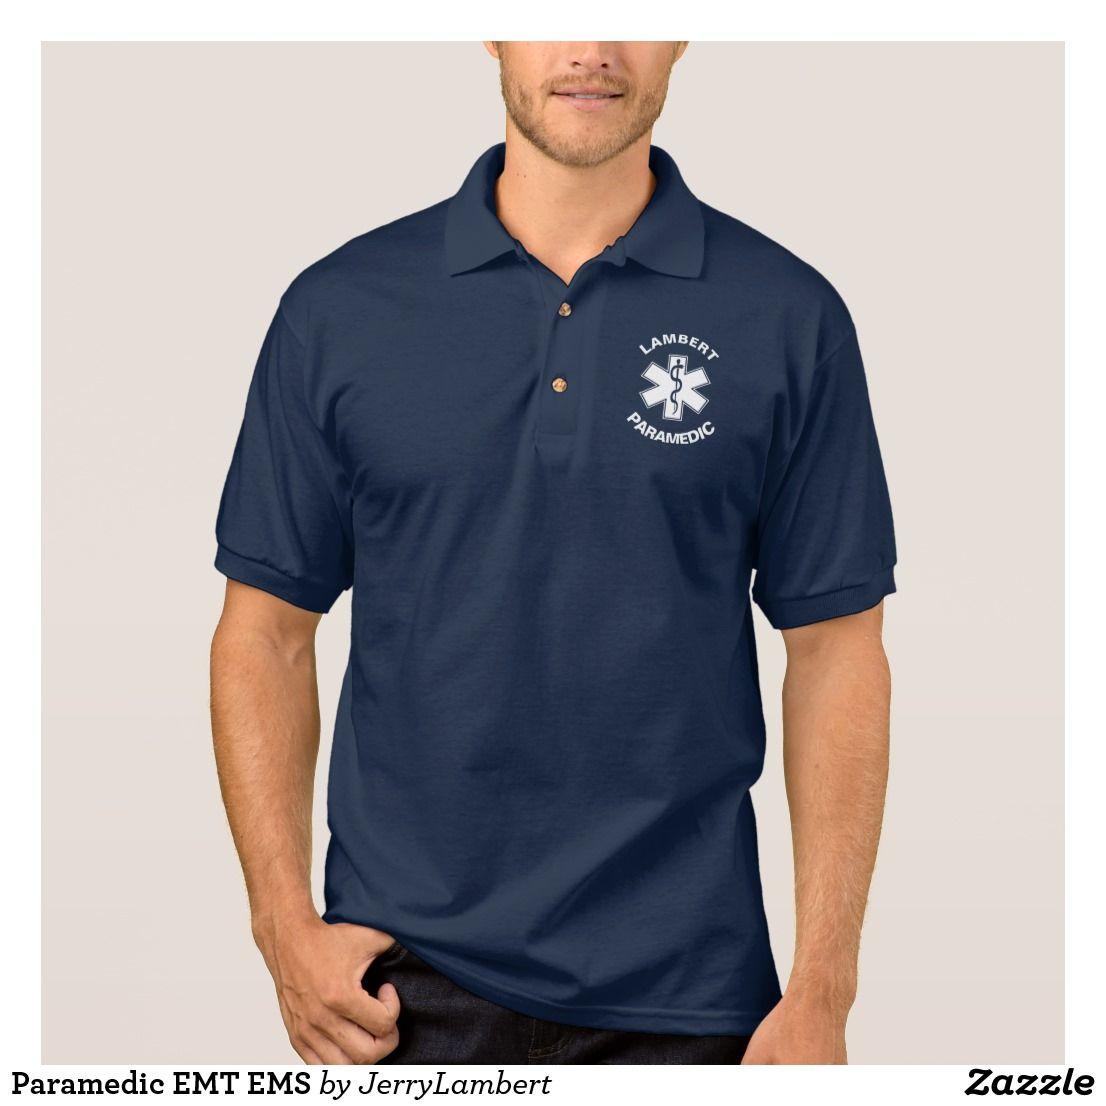 Paramedic Emt Ems Polo Shirt Great Shirt For Paramedics Emts And